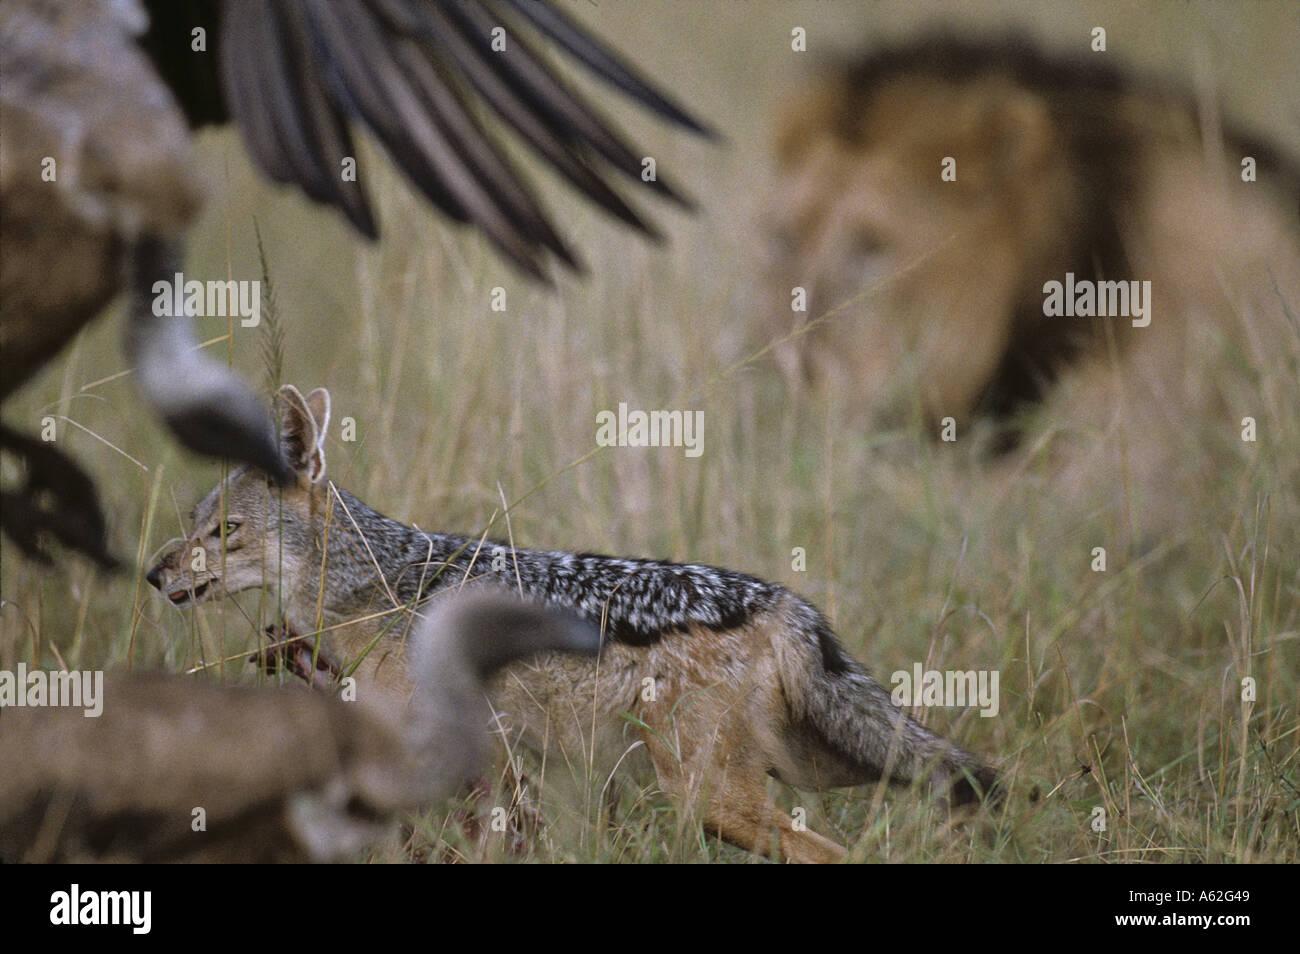 Africa Kenya Masai Mara Game Reserve Black Backed Jackal Canis mesomelas feeding on scraps from Lion kill on savanna Stock Photo